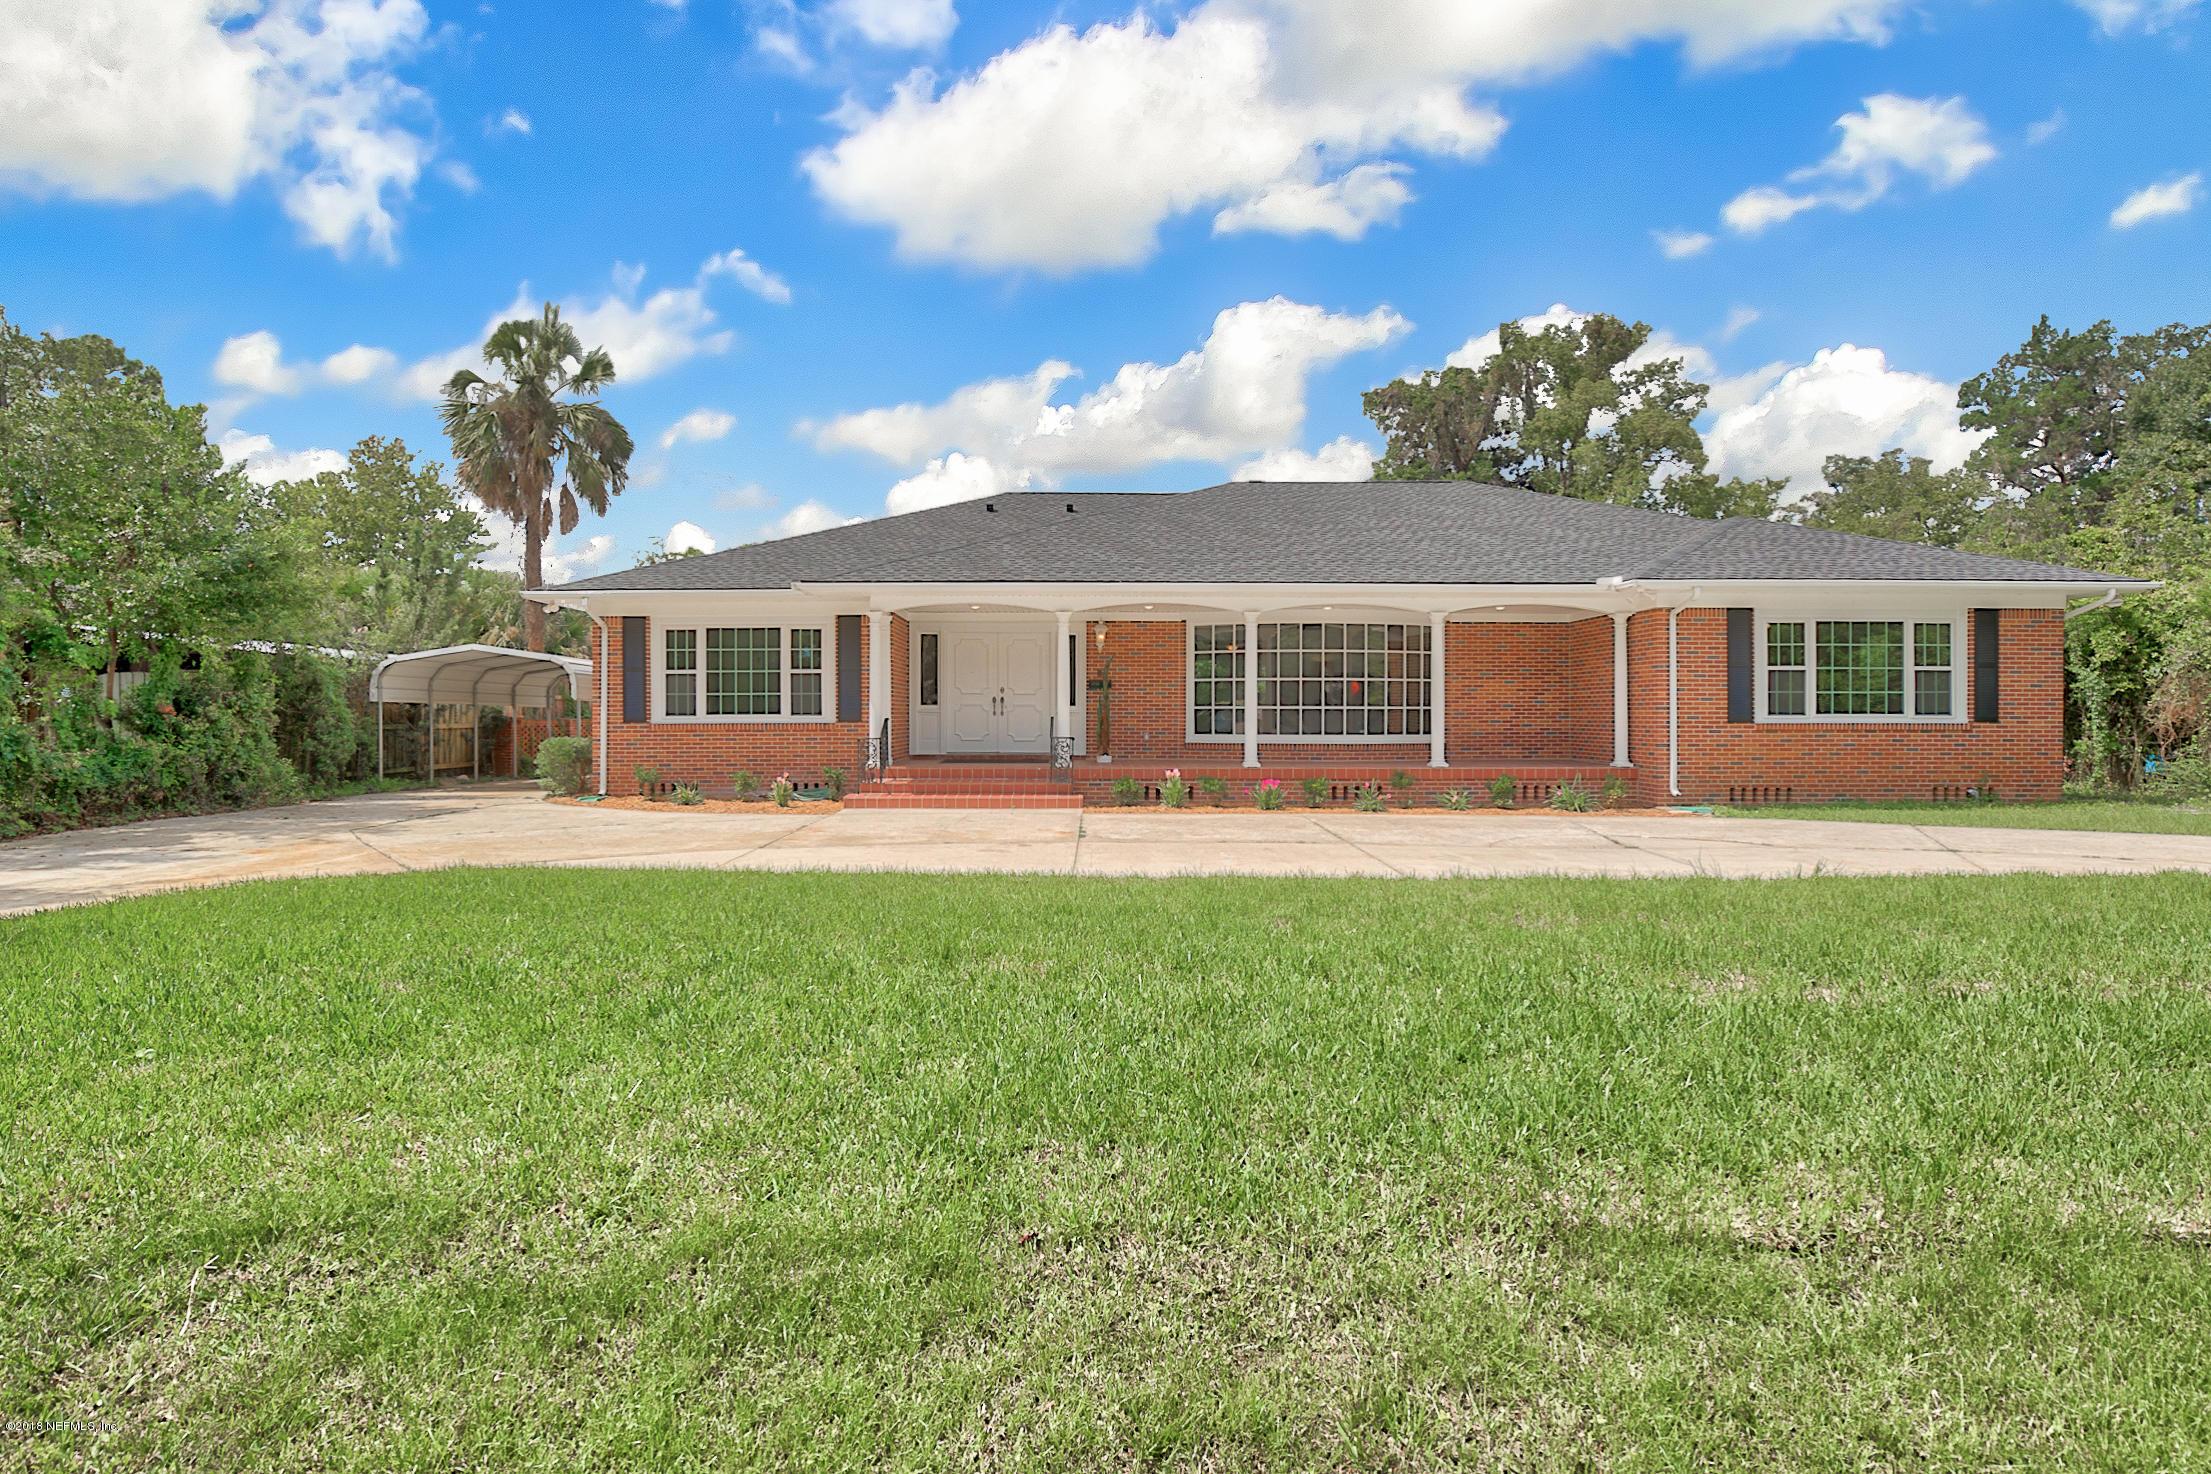 2330 HENDRICKS, JACKSONVILLE, FLORIDA 32207, 4 Bedrooms Bedrooms, ,4 BathroomsBathrooms,Residential - single family,For sale,HENDRICKS,956198